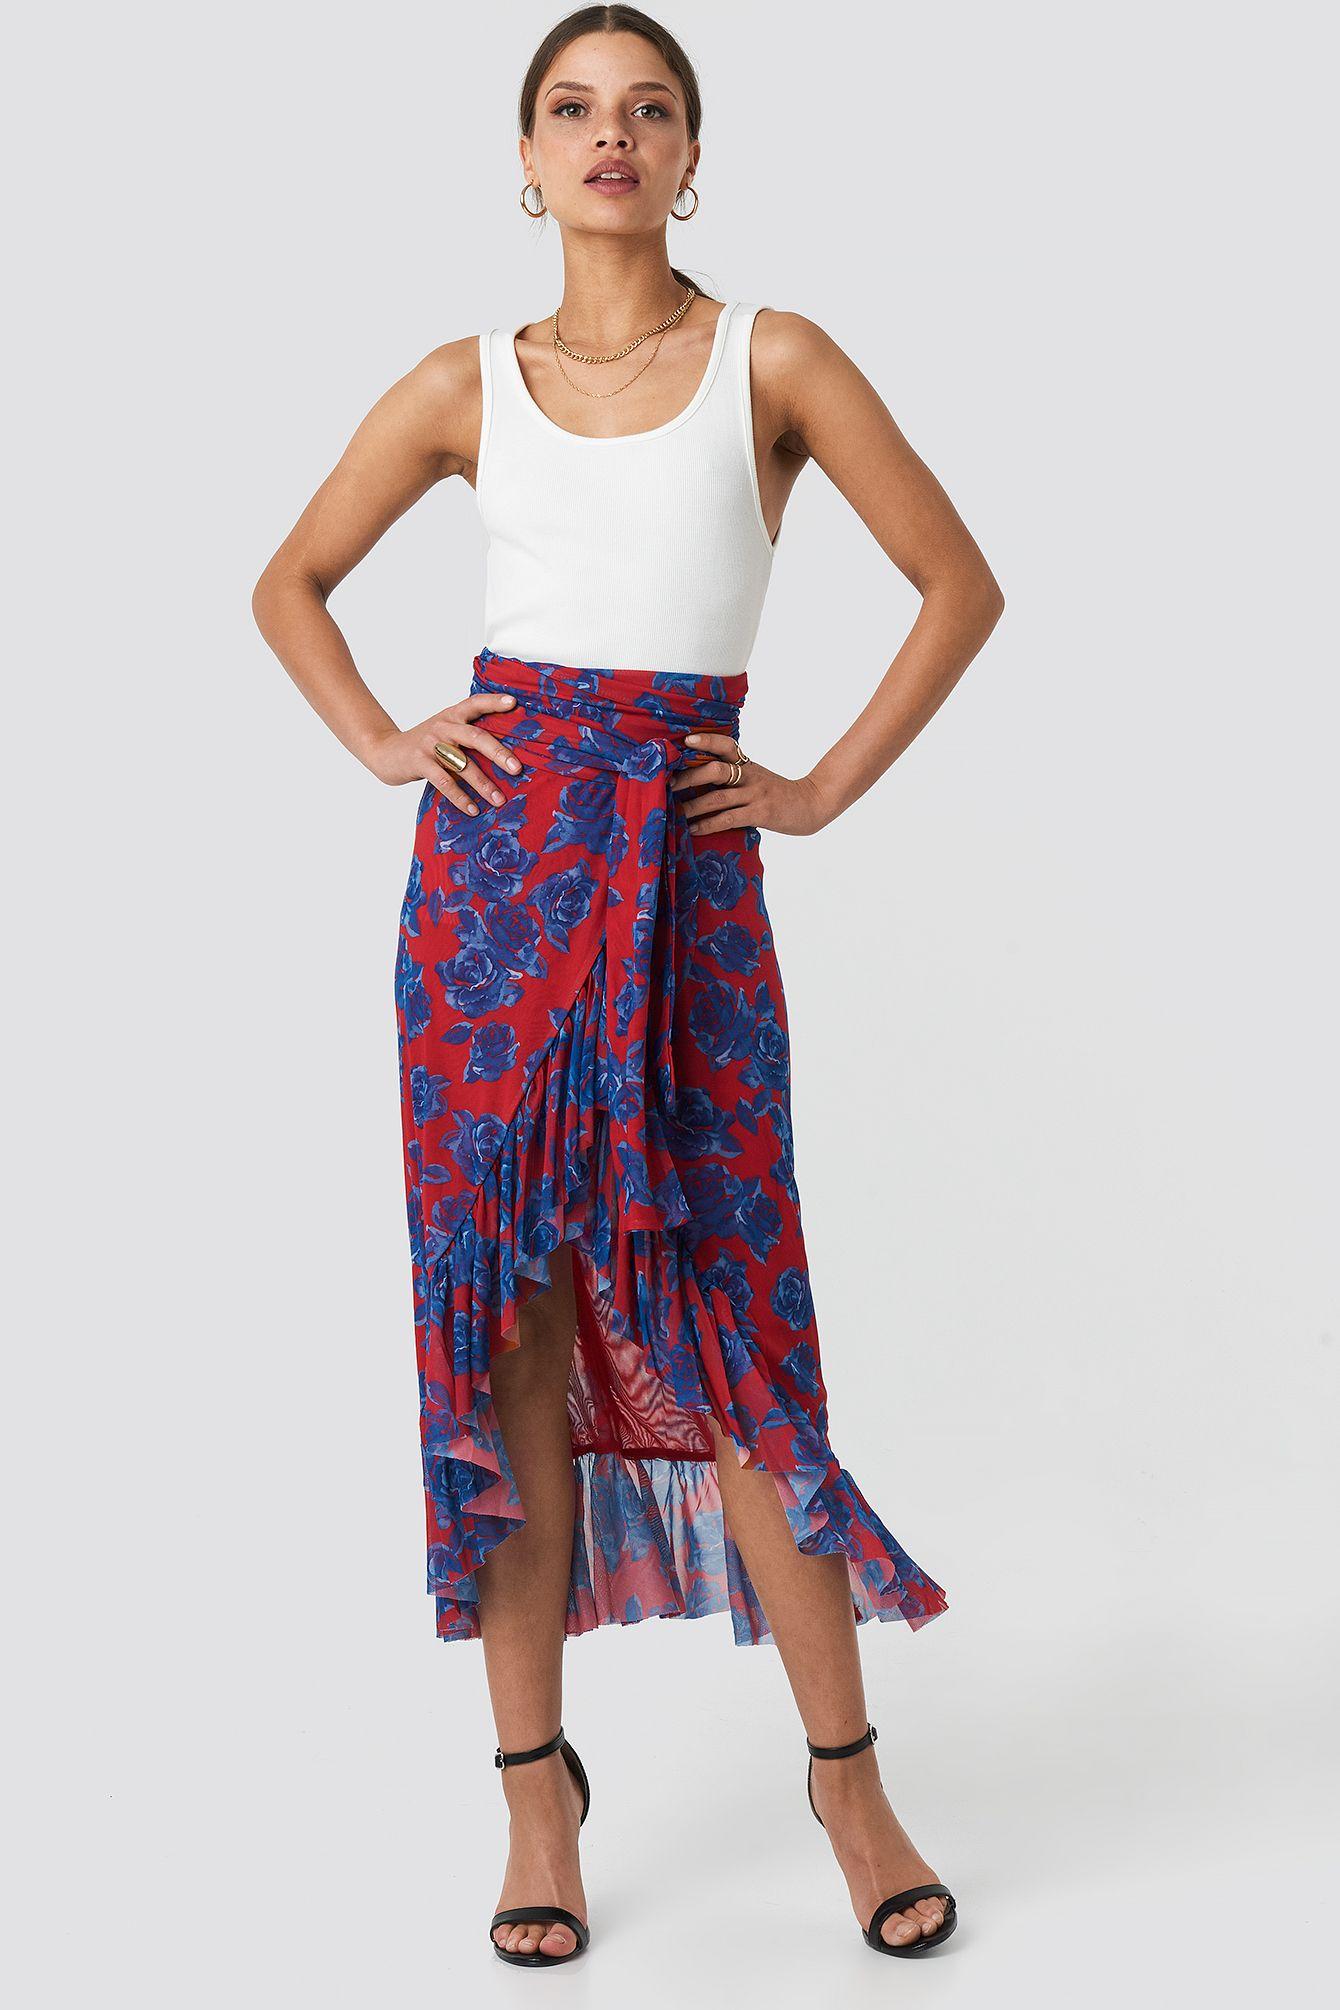 Mesh Overlap Maxi Skirt in 2020 | Modestil, Maxirock, Kleidung